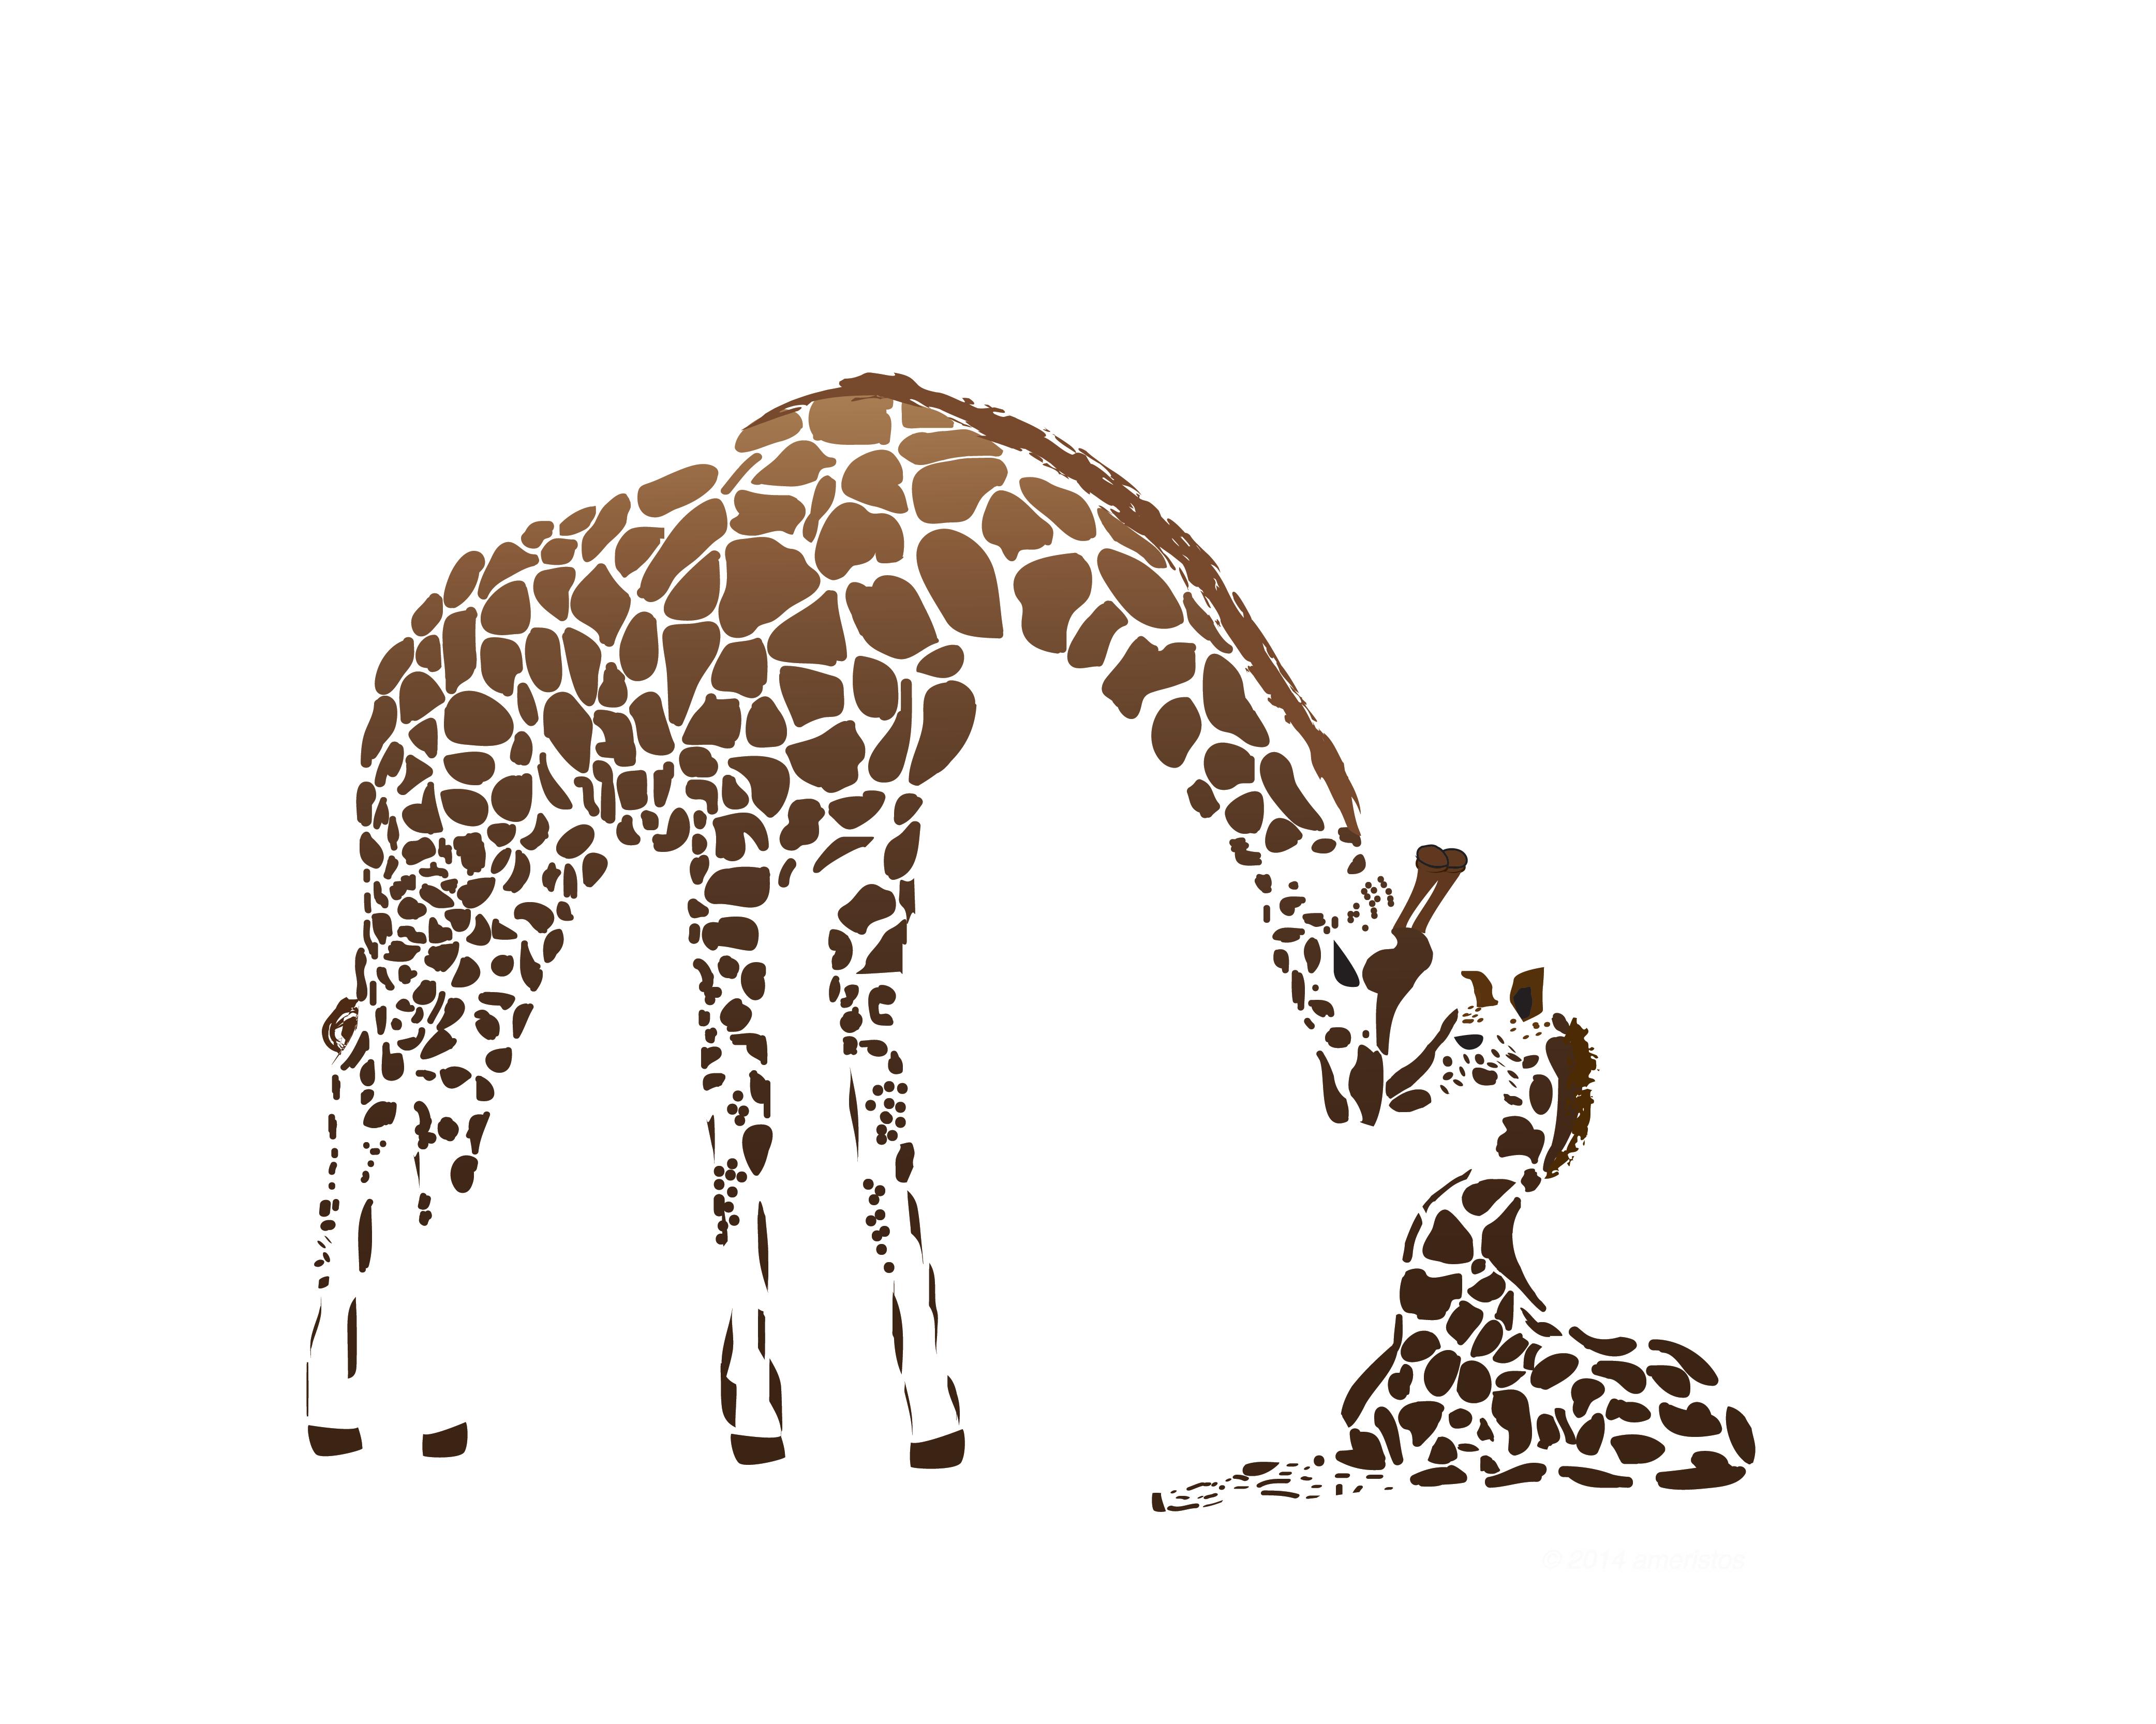 White Space Giraffe